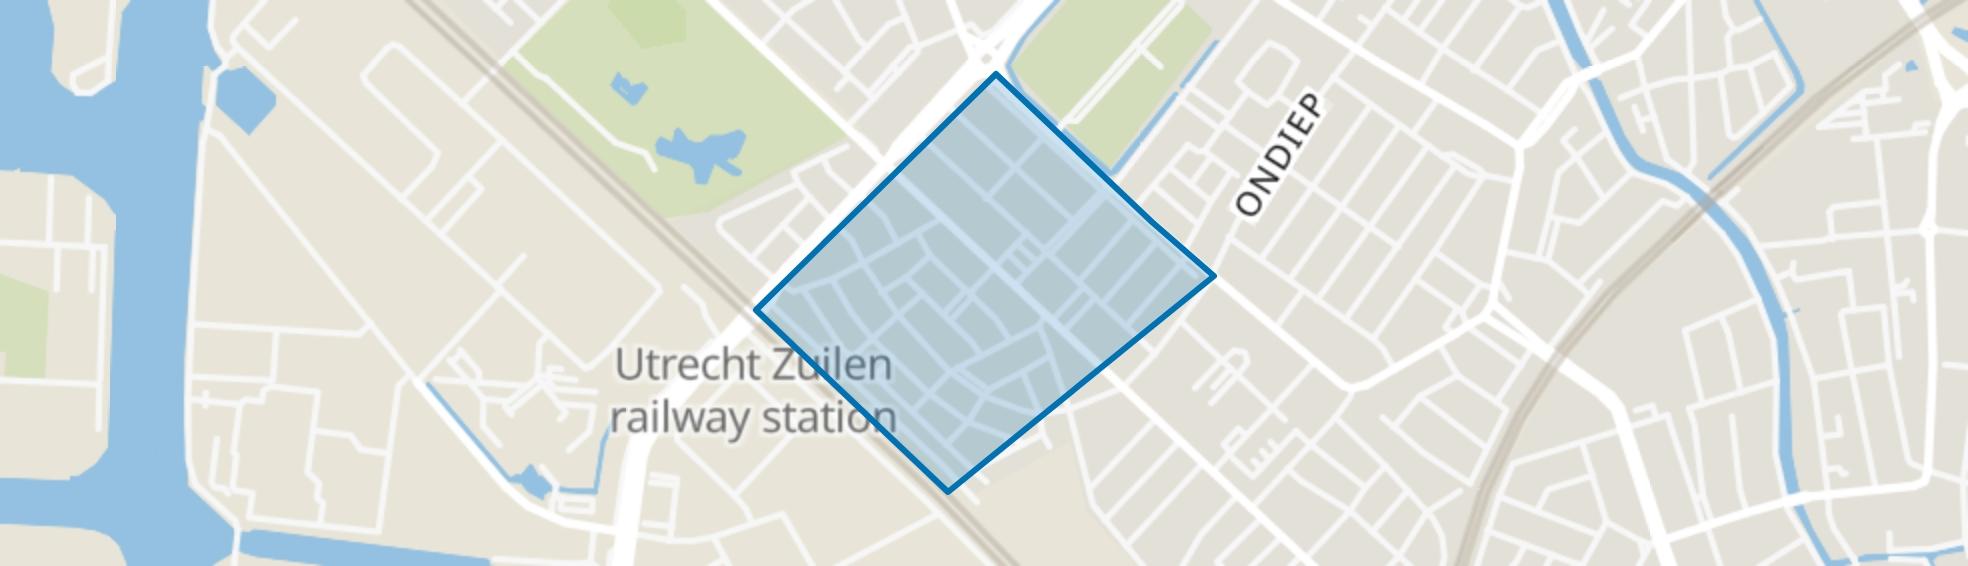 Egelantierstraat, Mariëndaalstraat e.o., Utrecht map